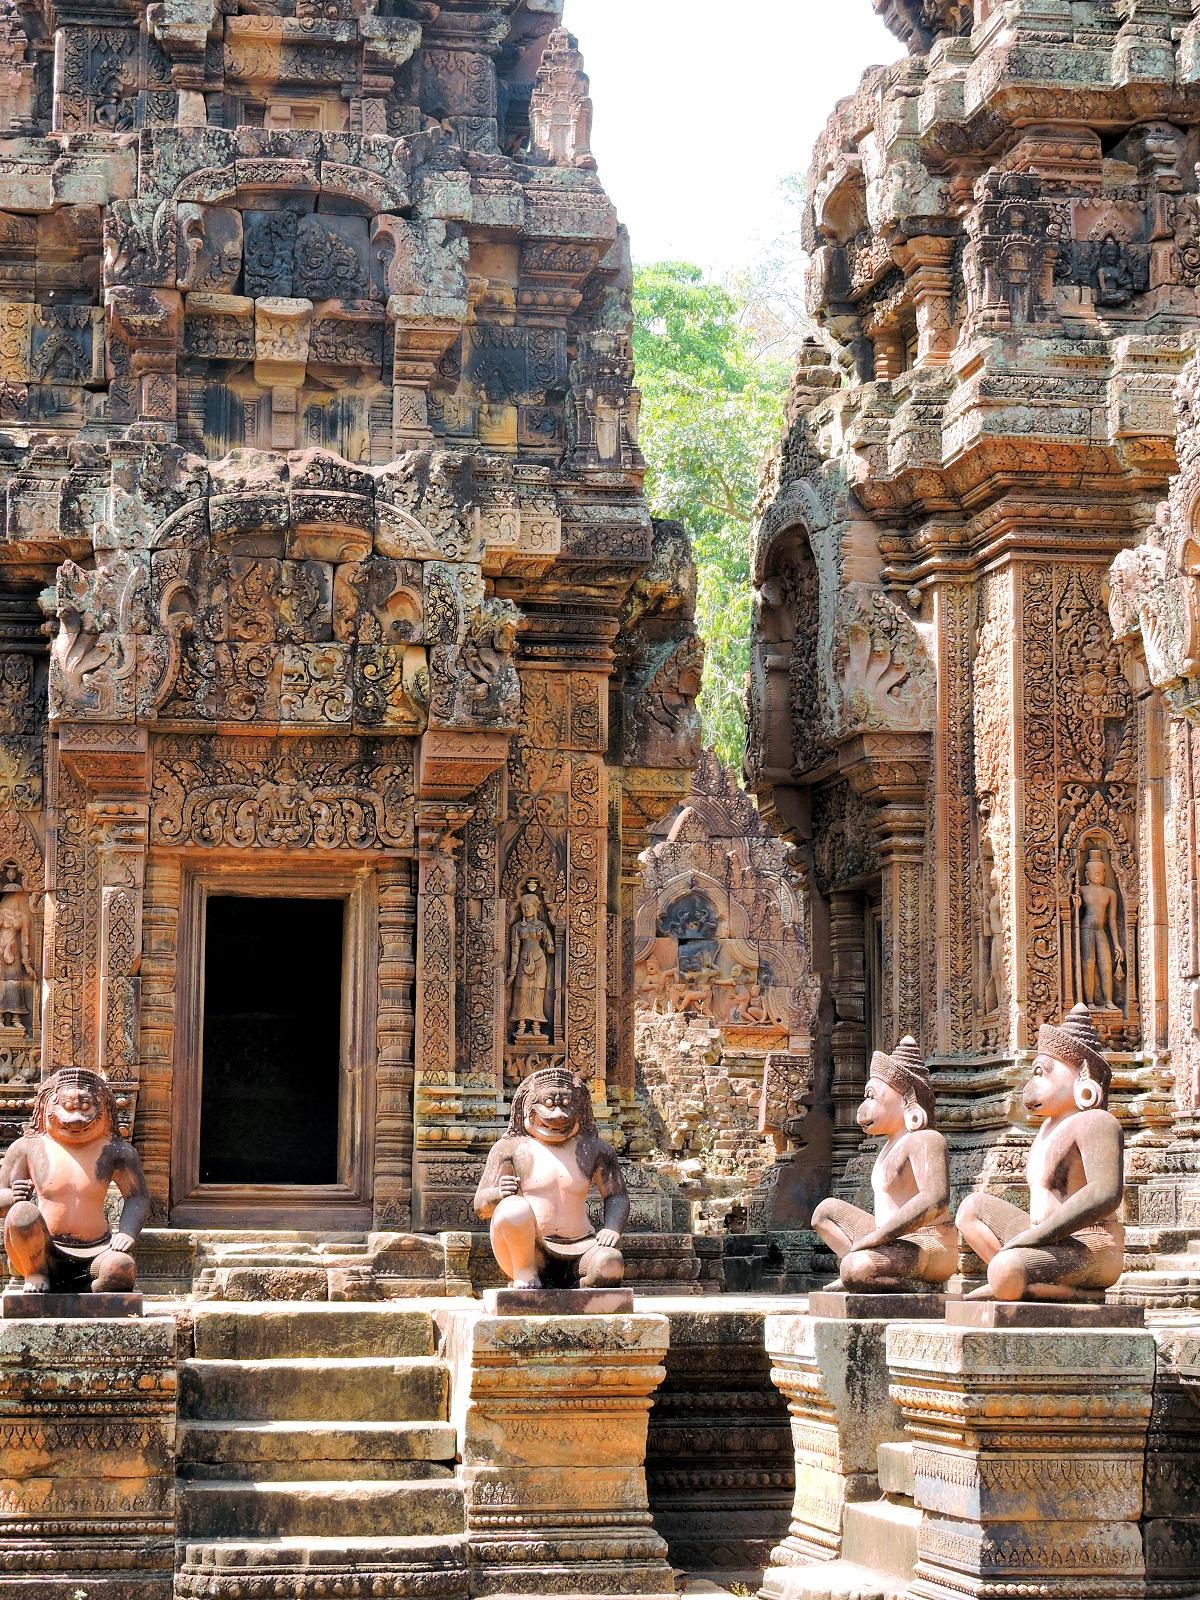 Pink Sandstone temples of Banteay Srei